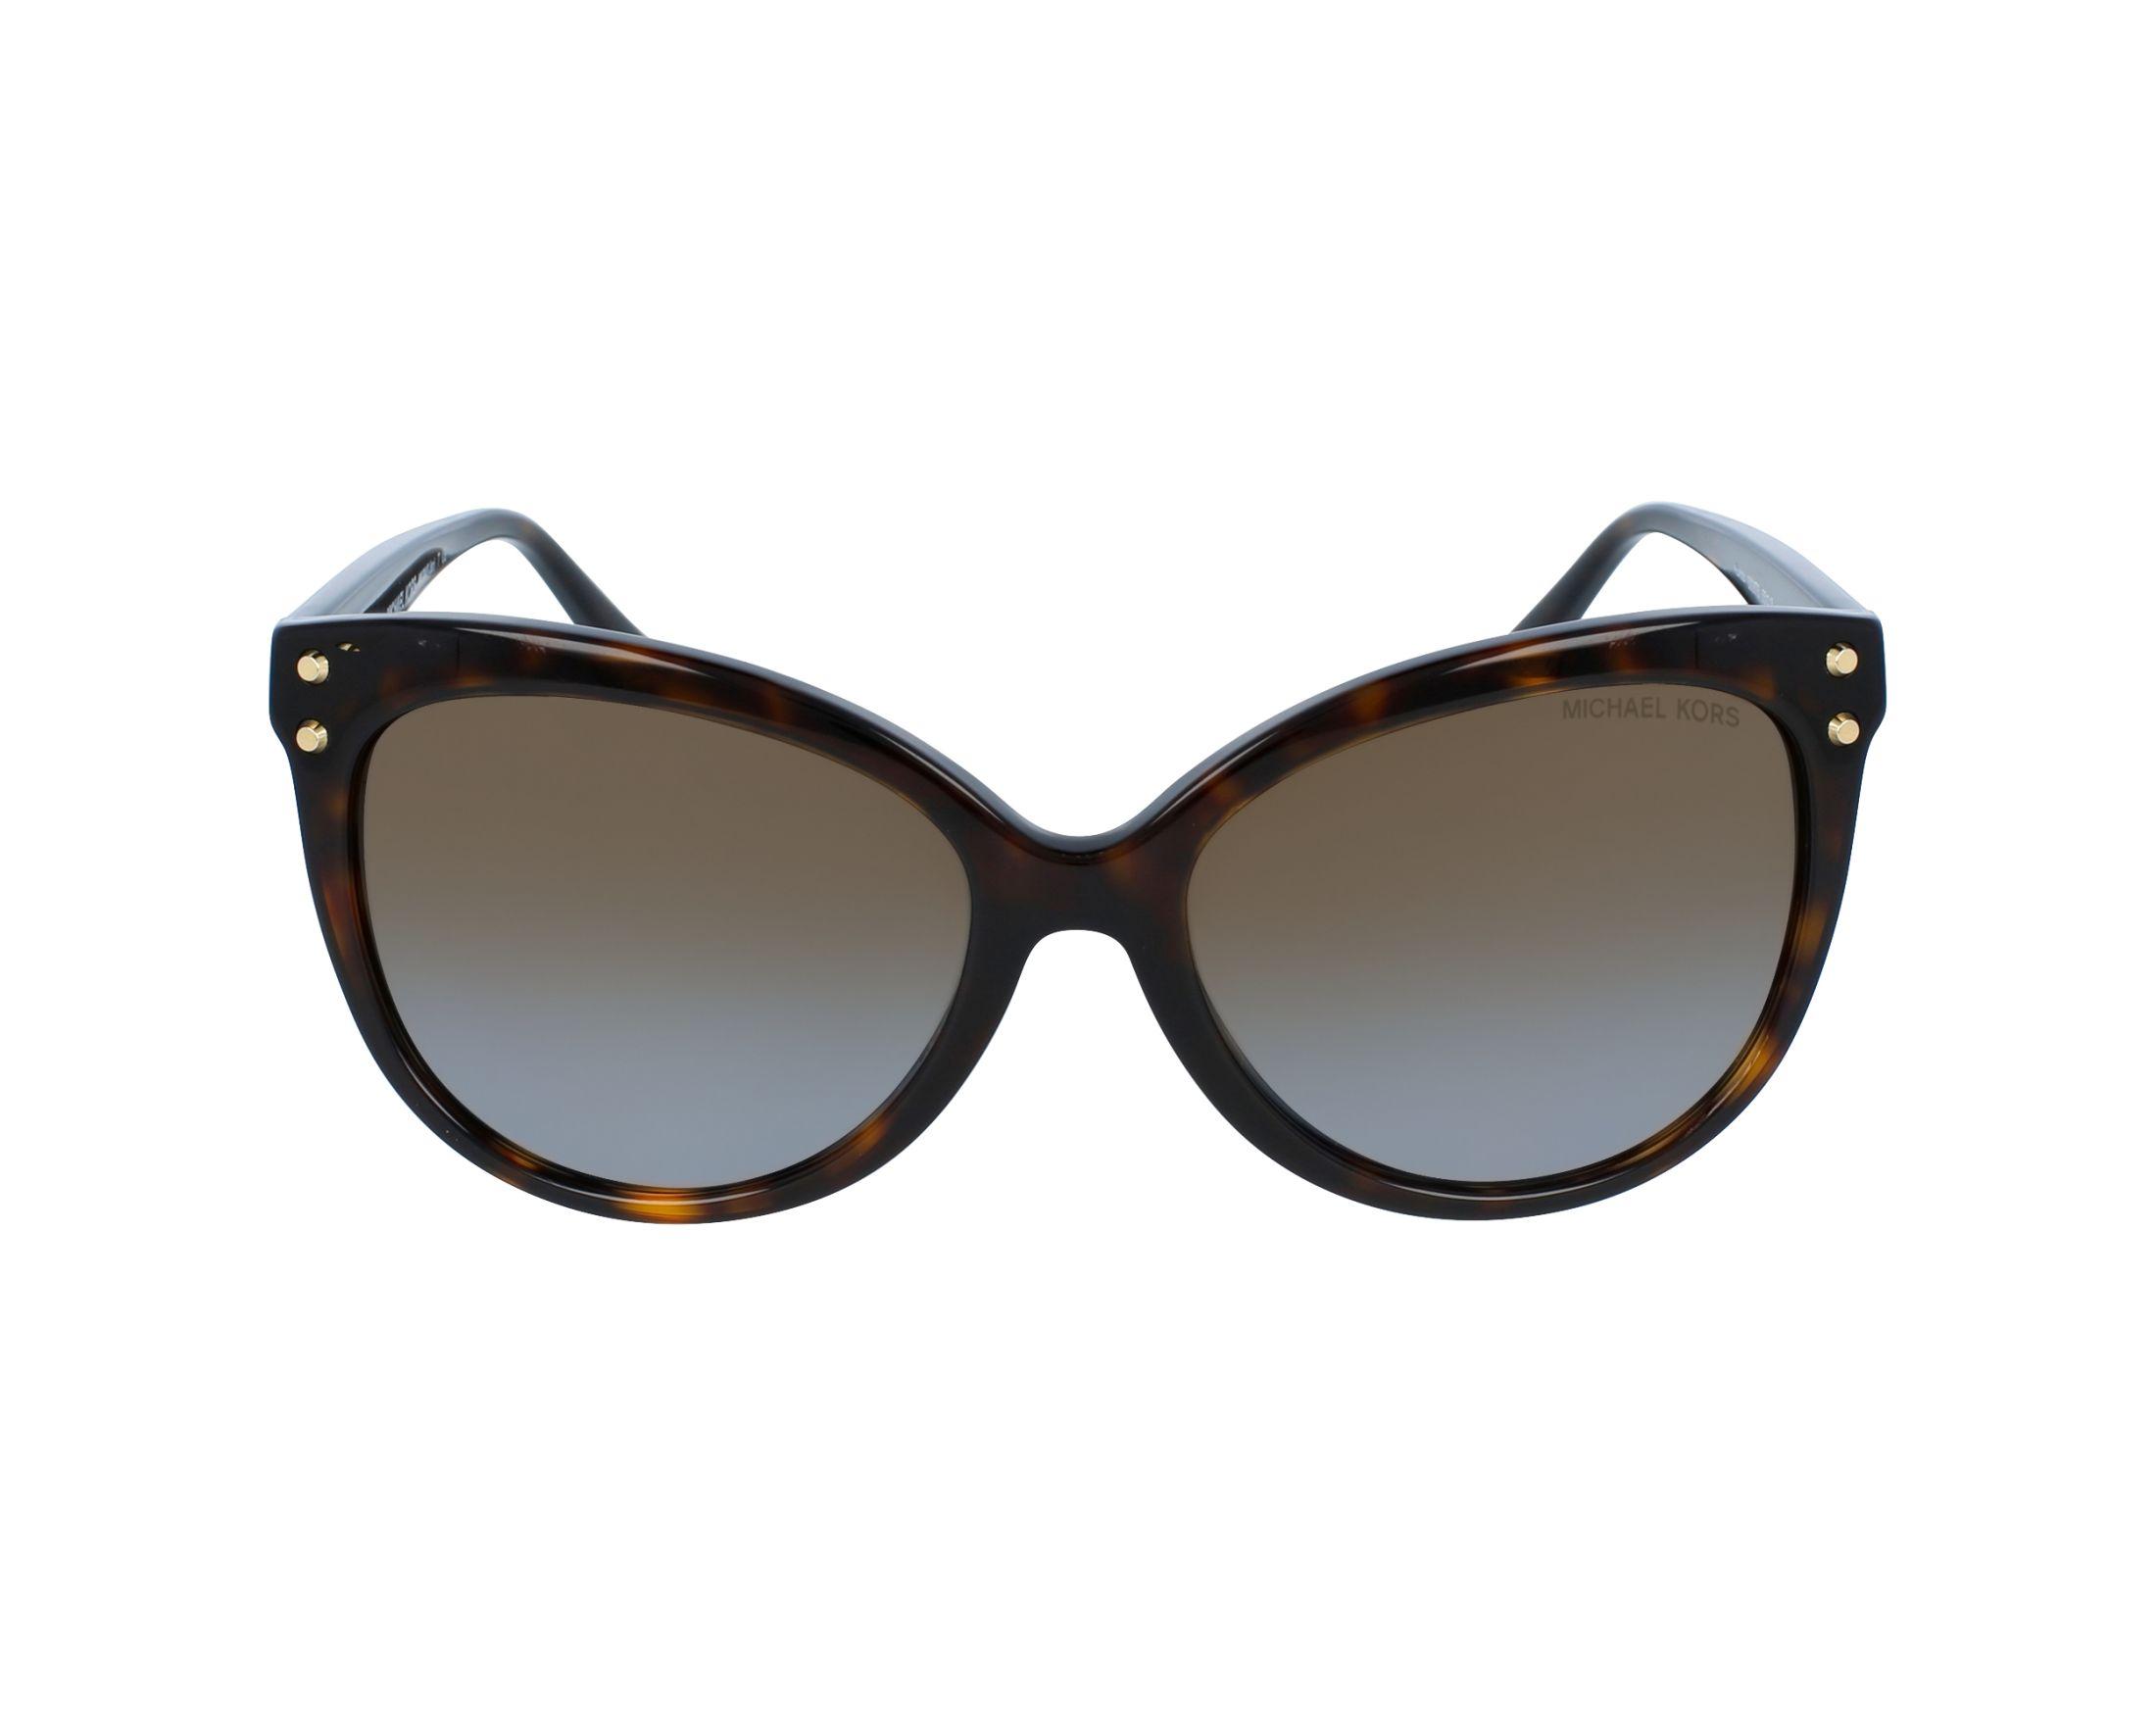 2f6ac677aea0 Polarized. Sunglasses Michael Kors MK-2045 3006T5 - Havana Gold profile view